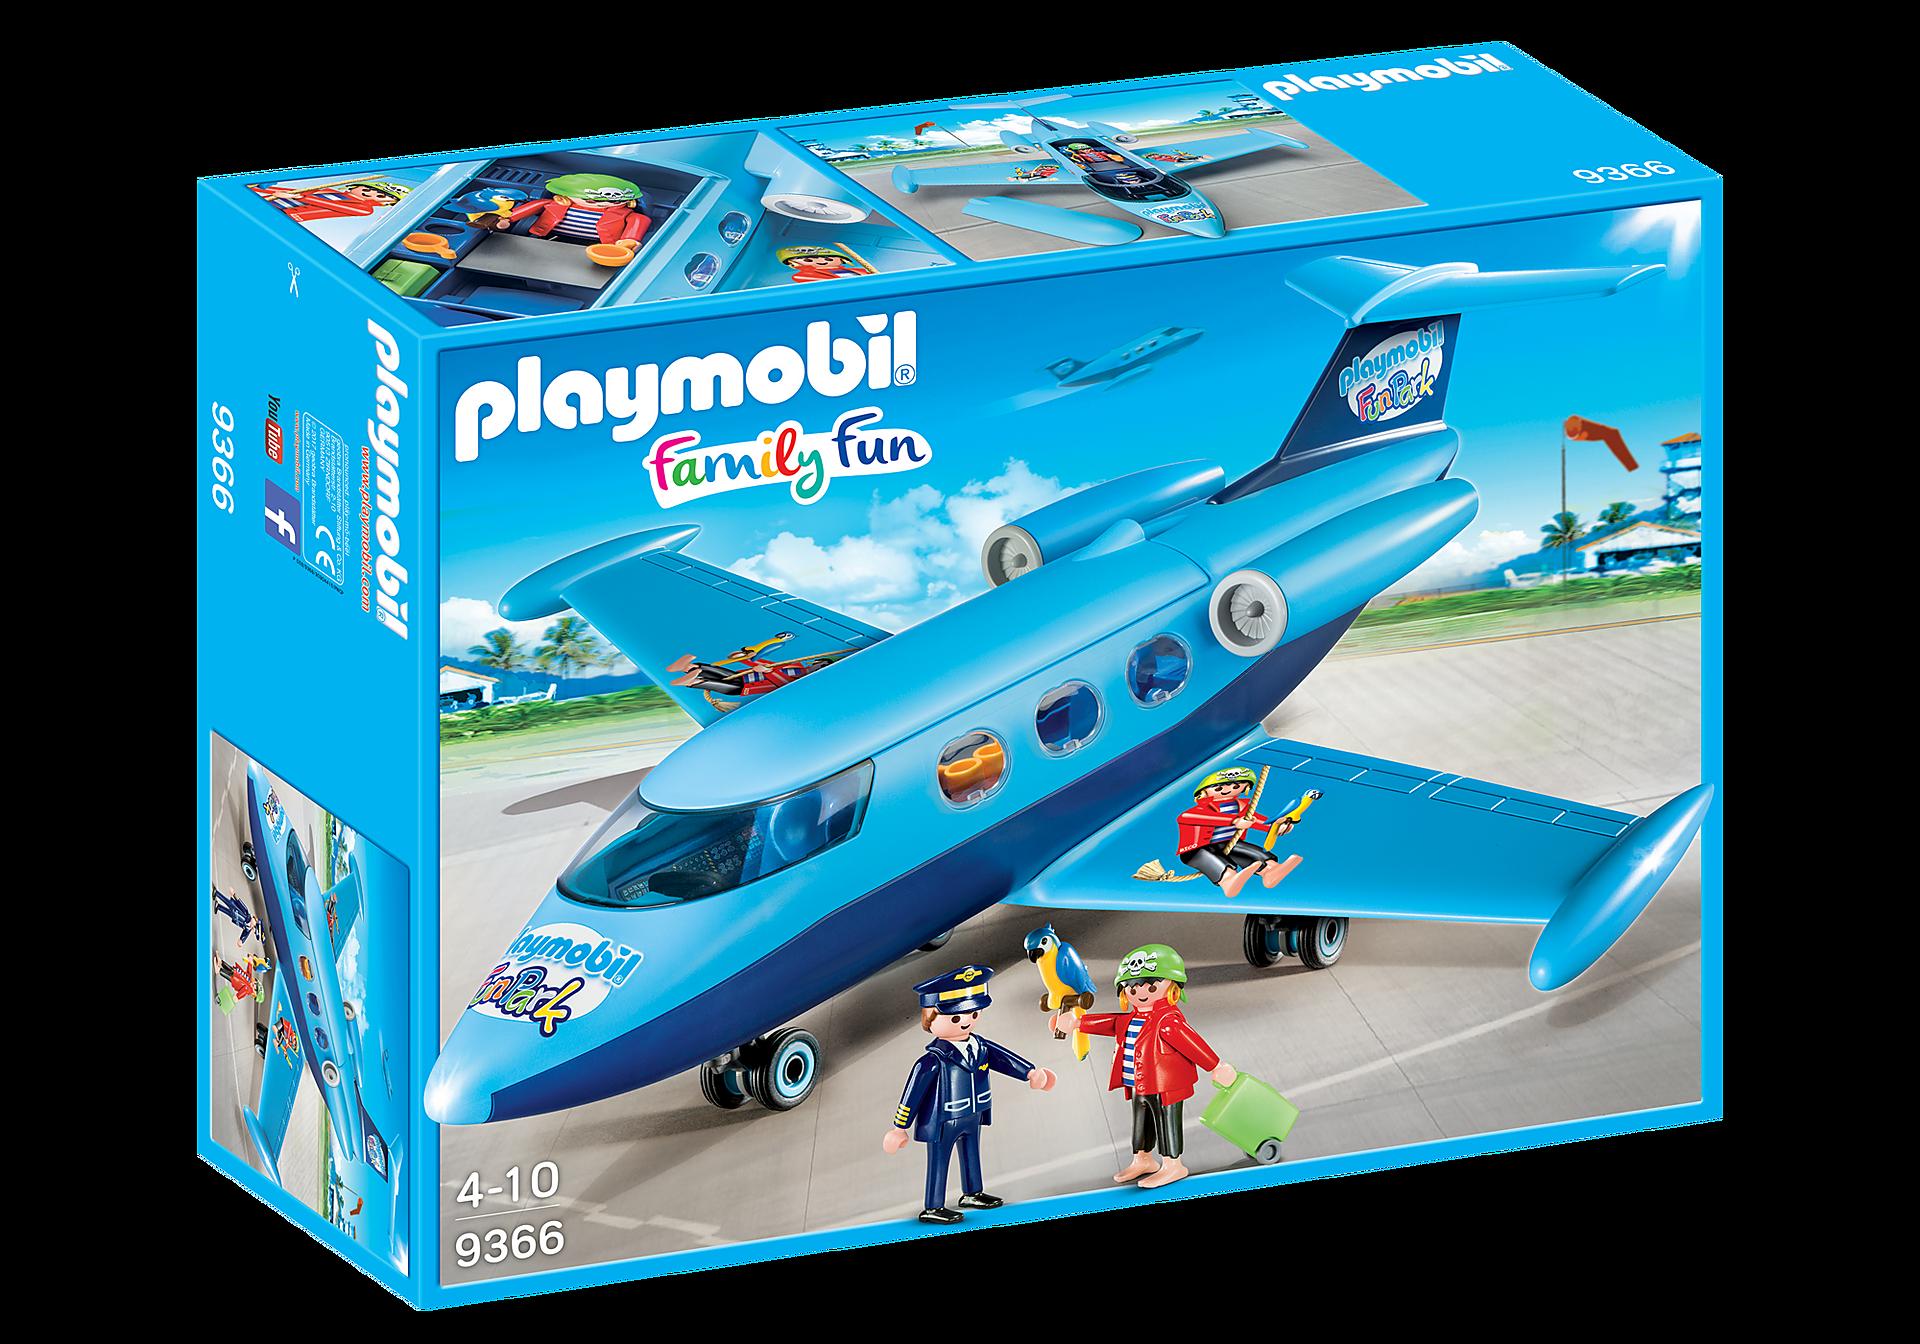 9366 PLAYMOBIL-FunPark Summer Jet zoom image2